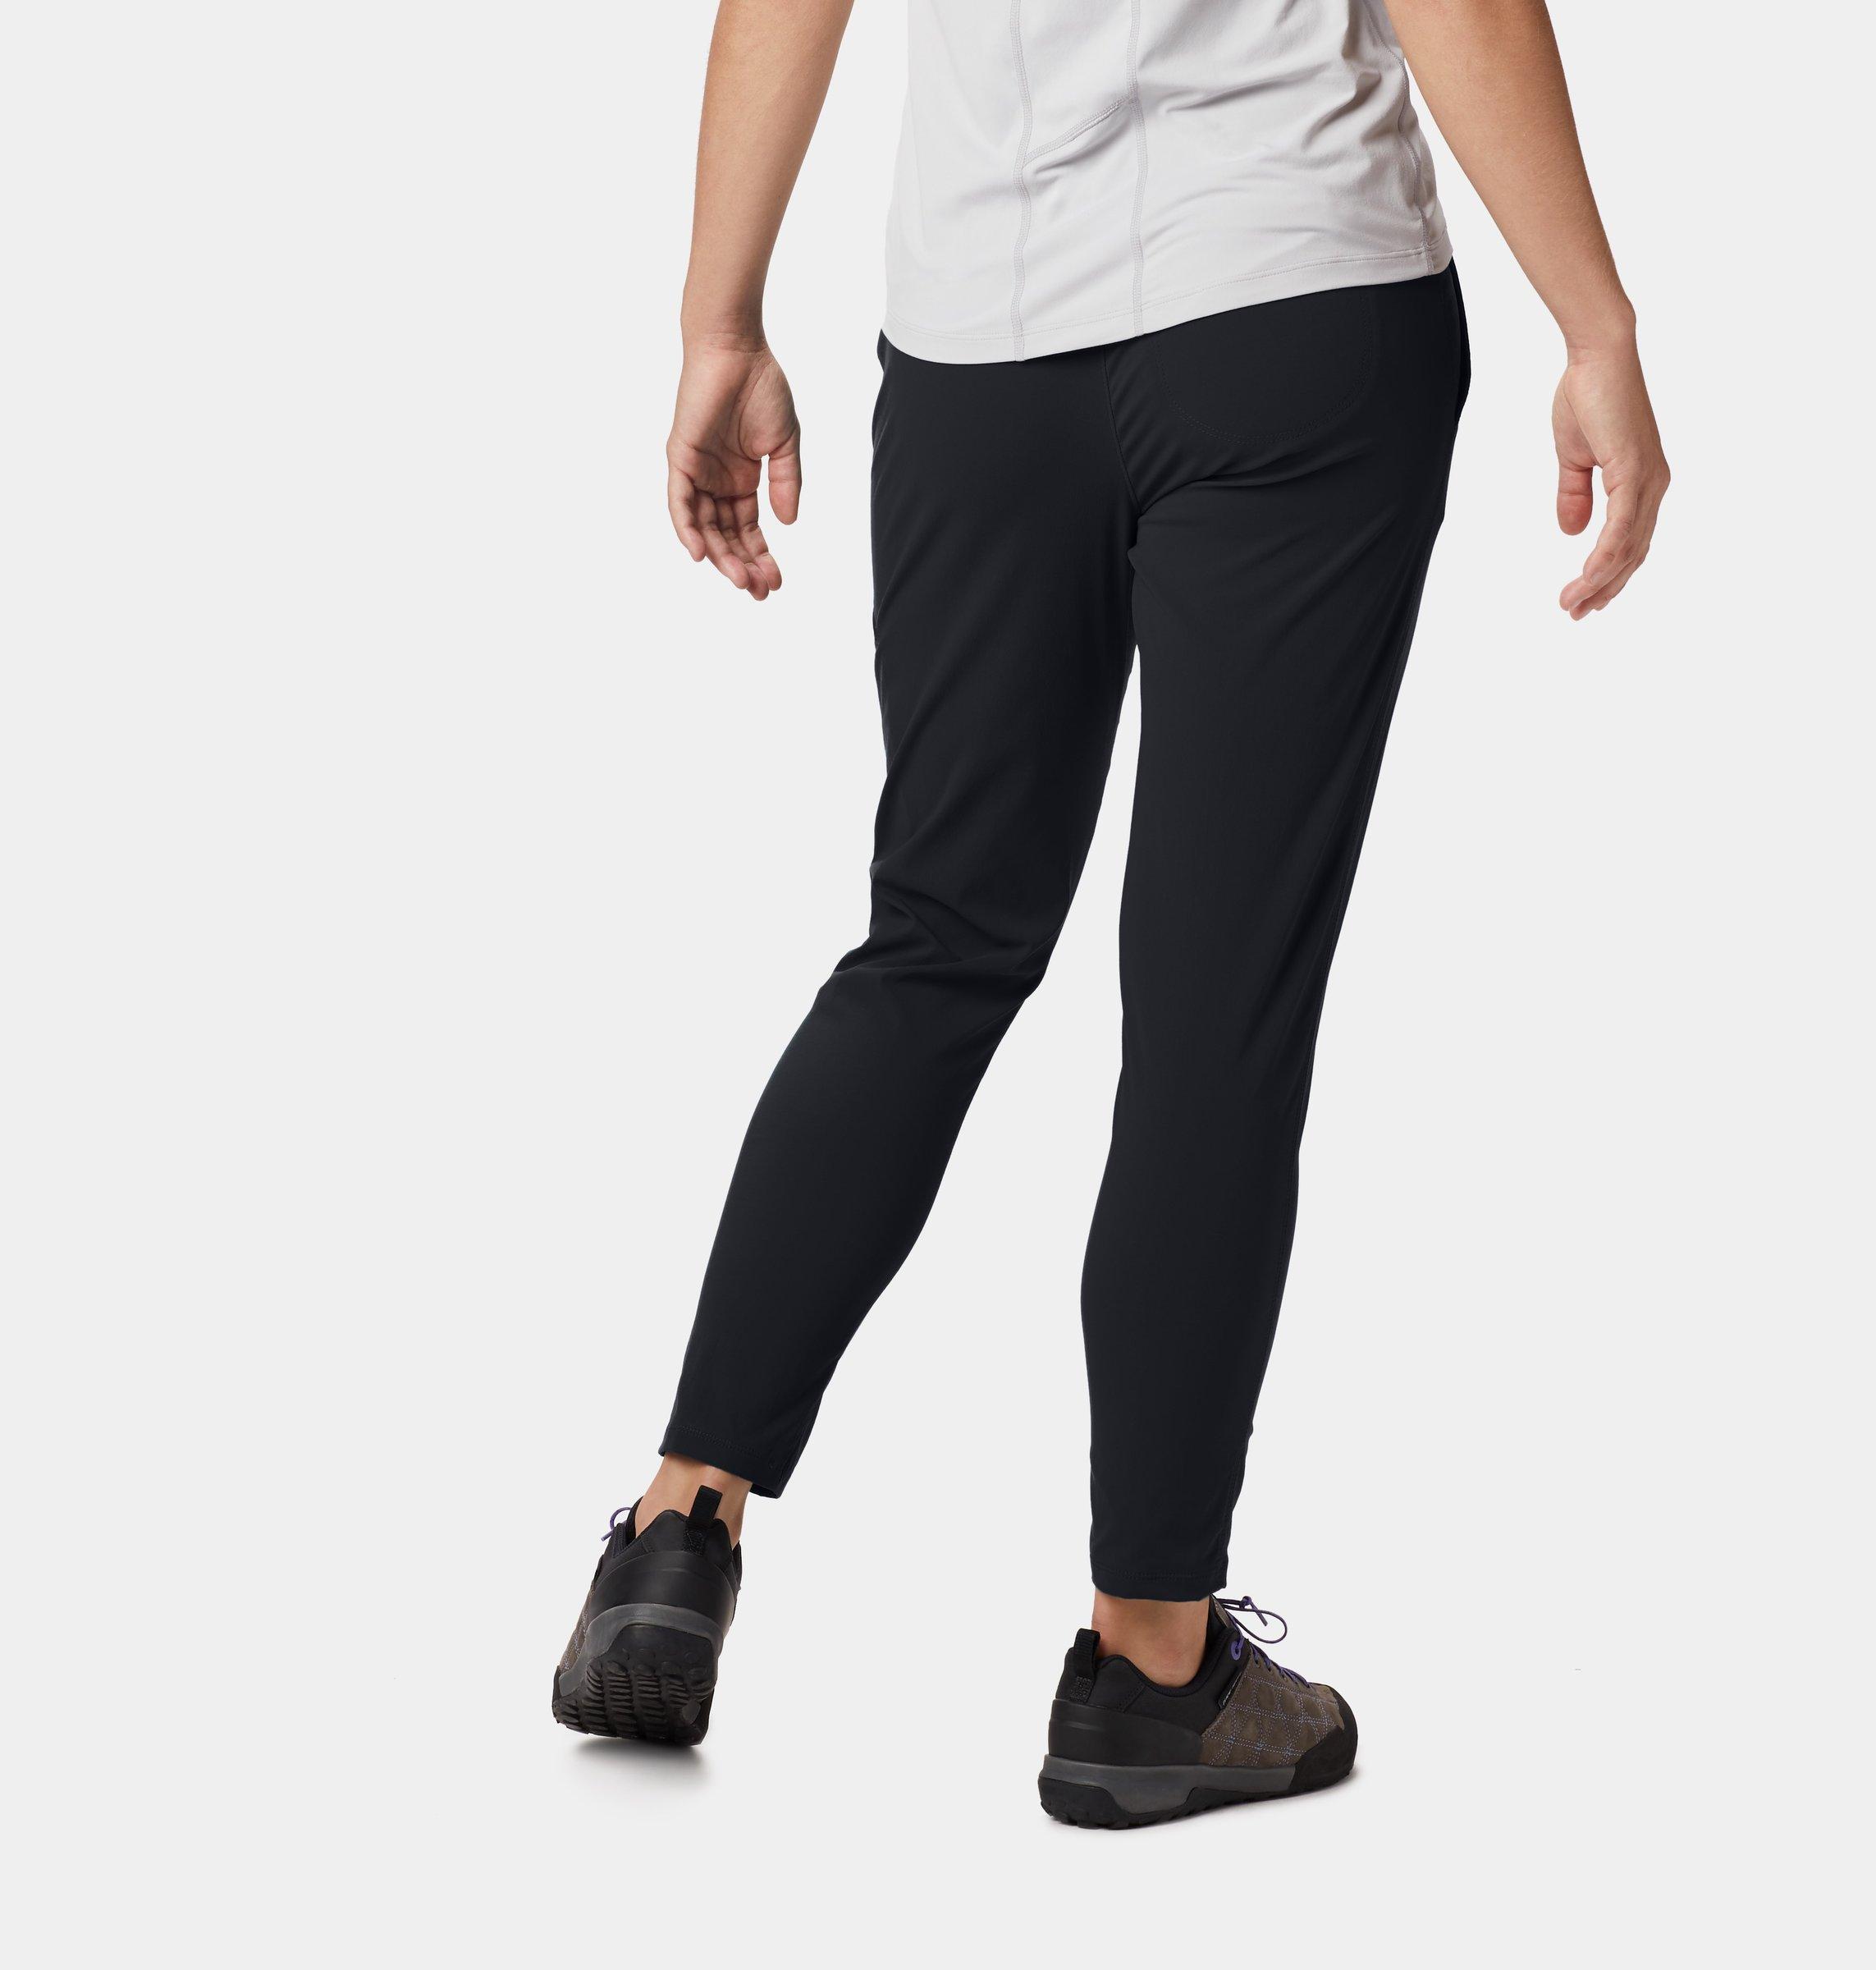 d8f47f919 Dynama Ankle Pant - Women's